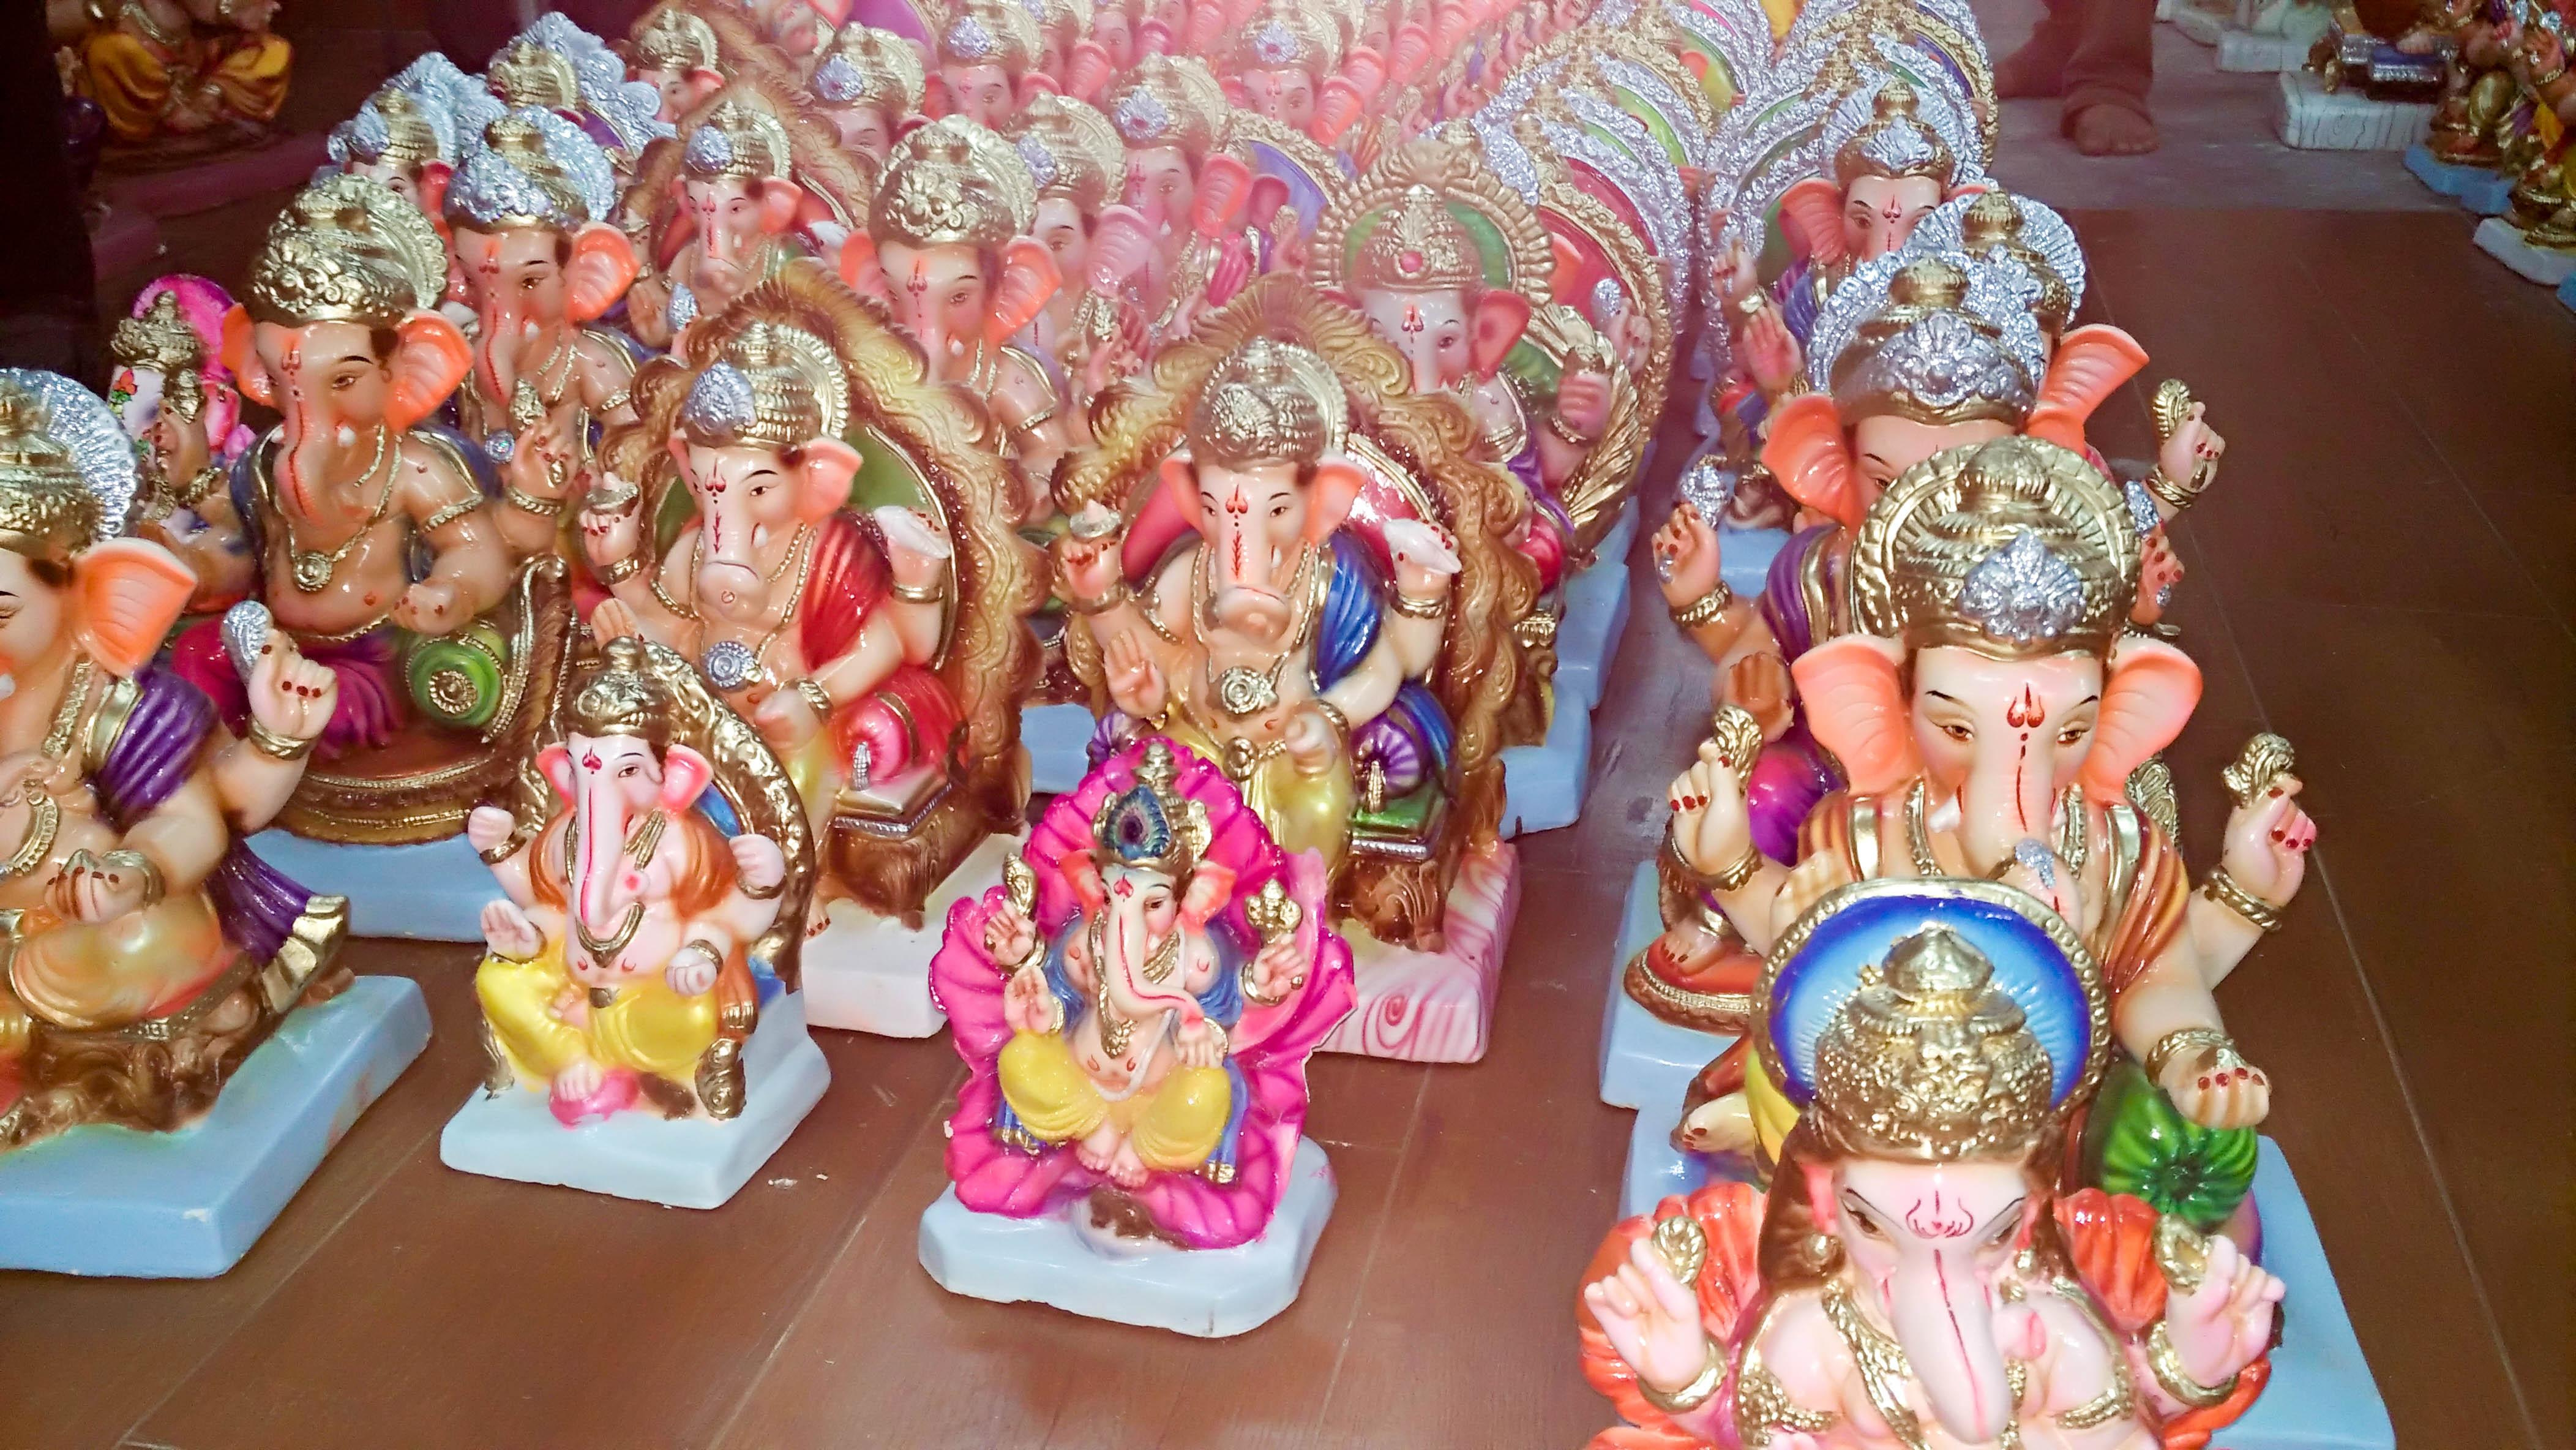 Ganesh Chaturthi 2020 date, tithi, significance, and Vrat Katha